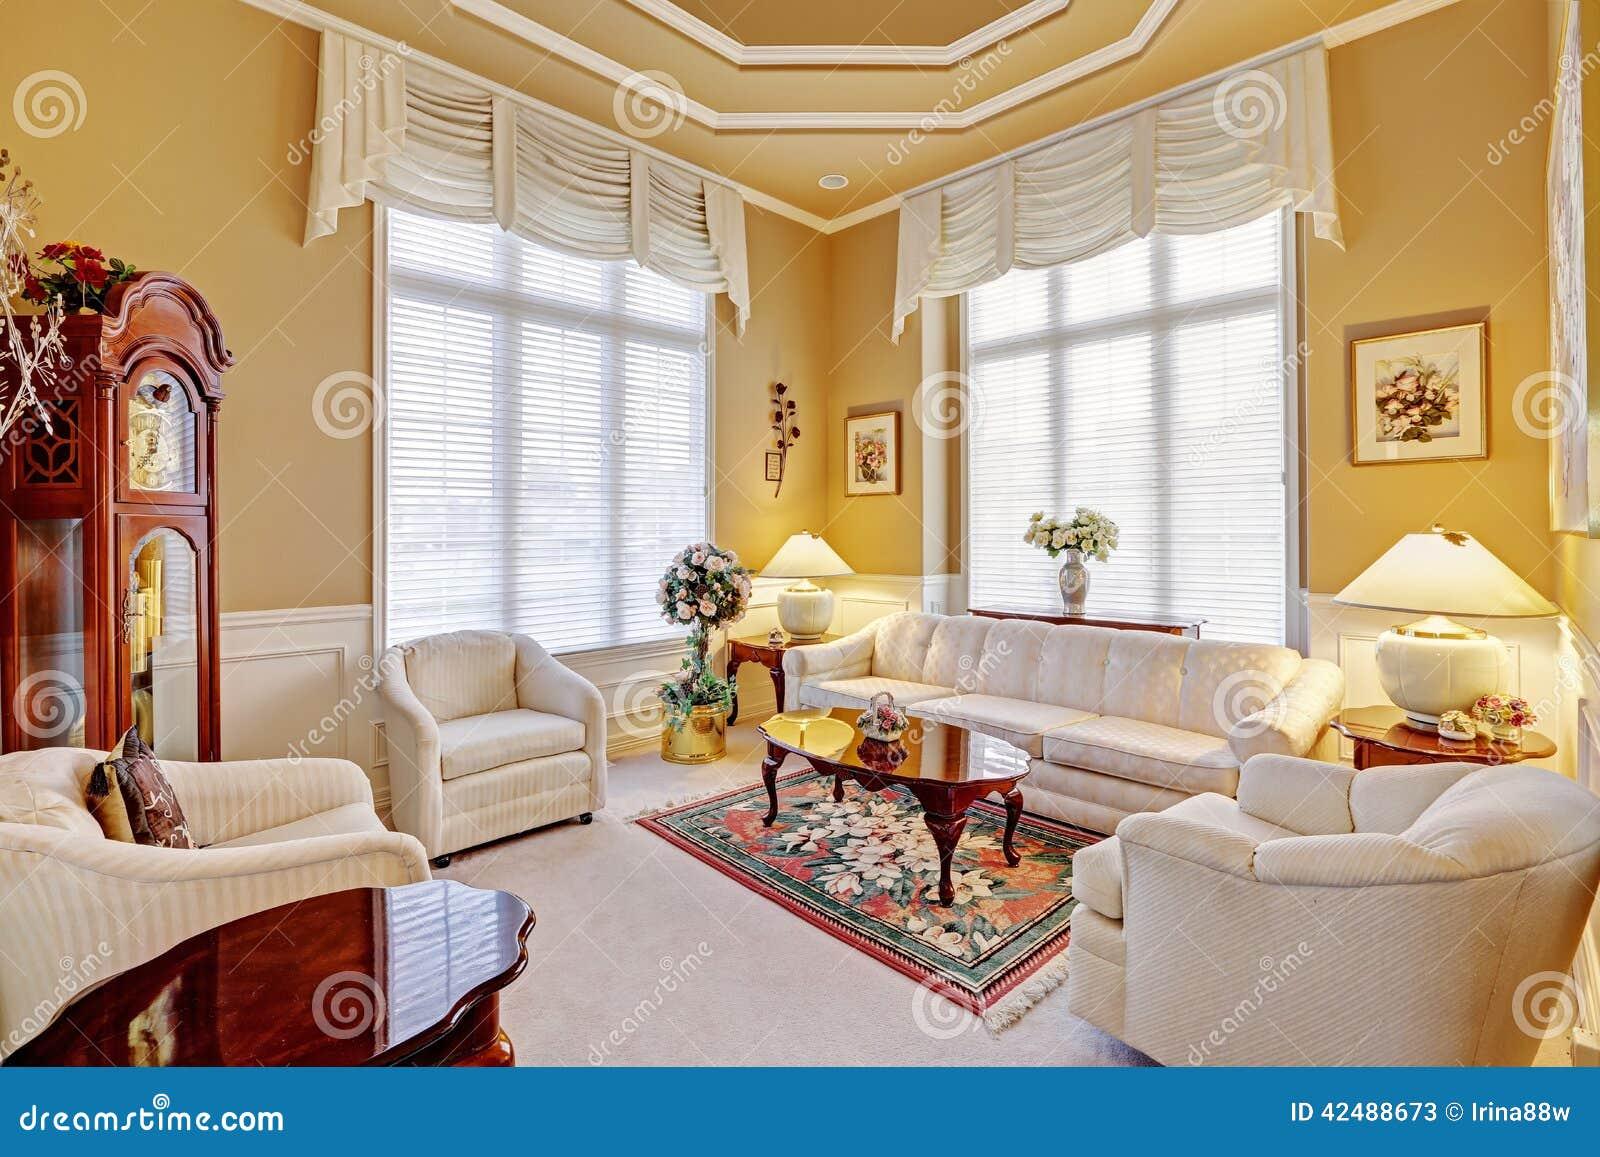 Luxury Room Interior With Antique Furniture Stock Photo